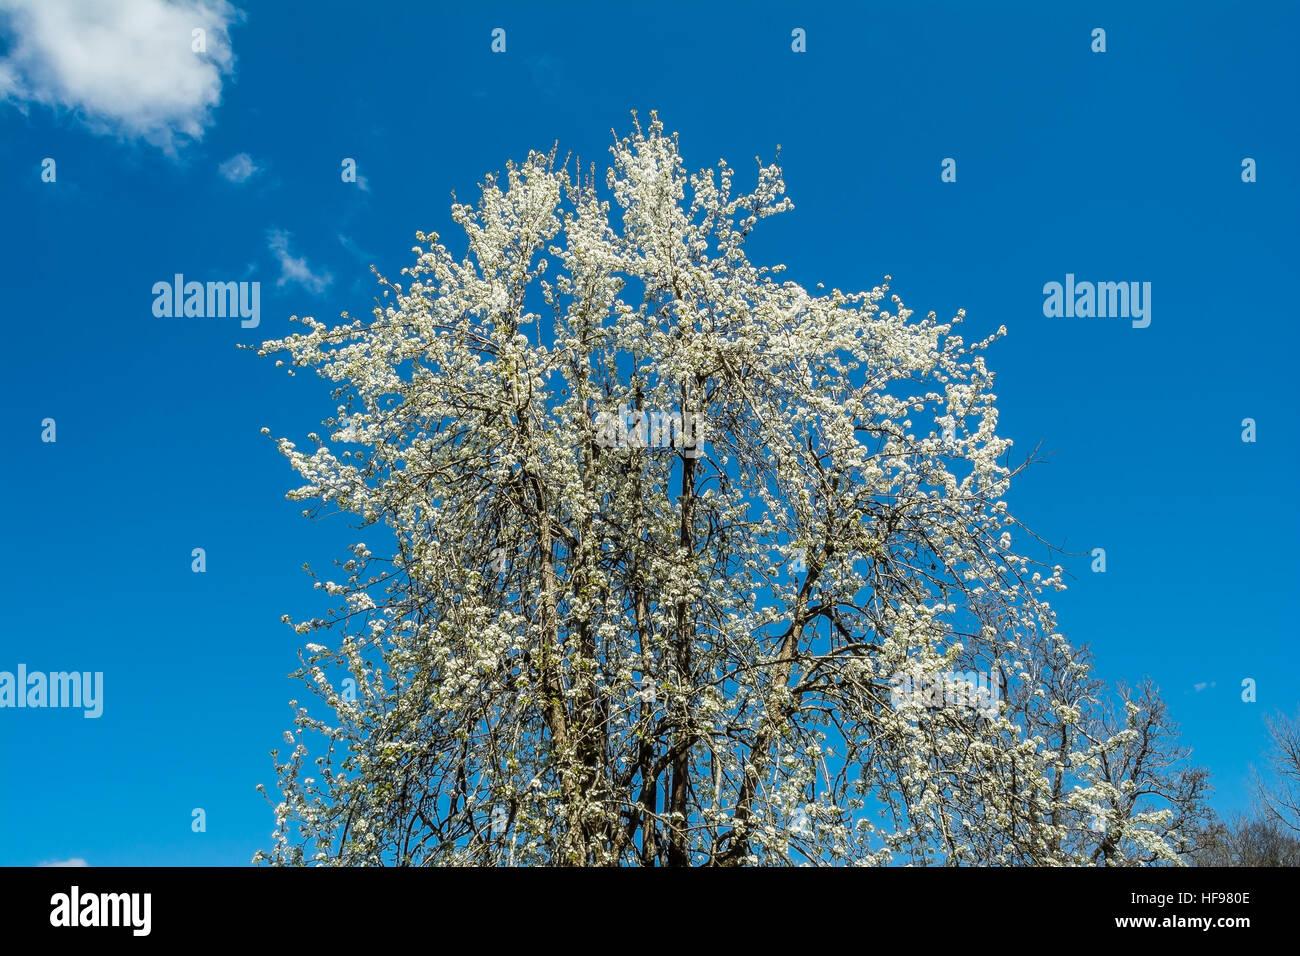 Fruit Tree Blossoms. - Stock Image